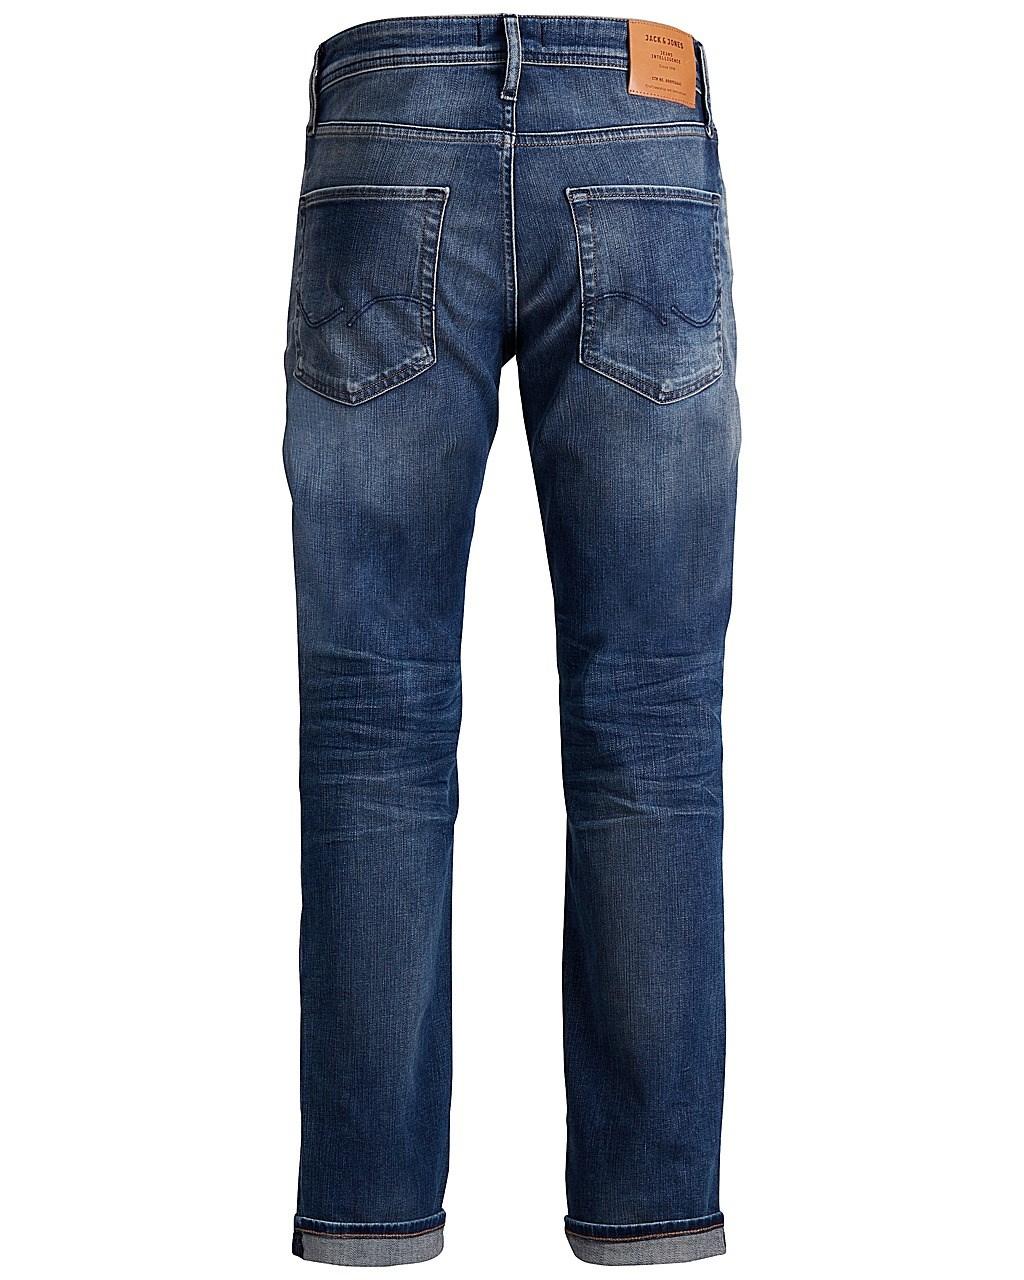 jack-jones-herren-jeans-jjiclark-jjoriginal-jos-317-regular-fit-blau-blue-denim